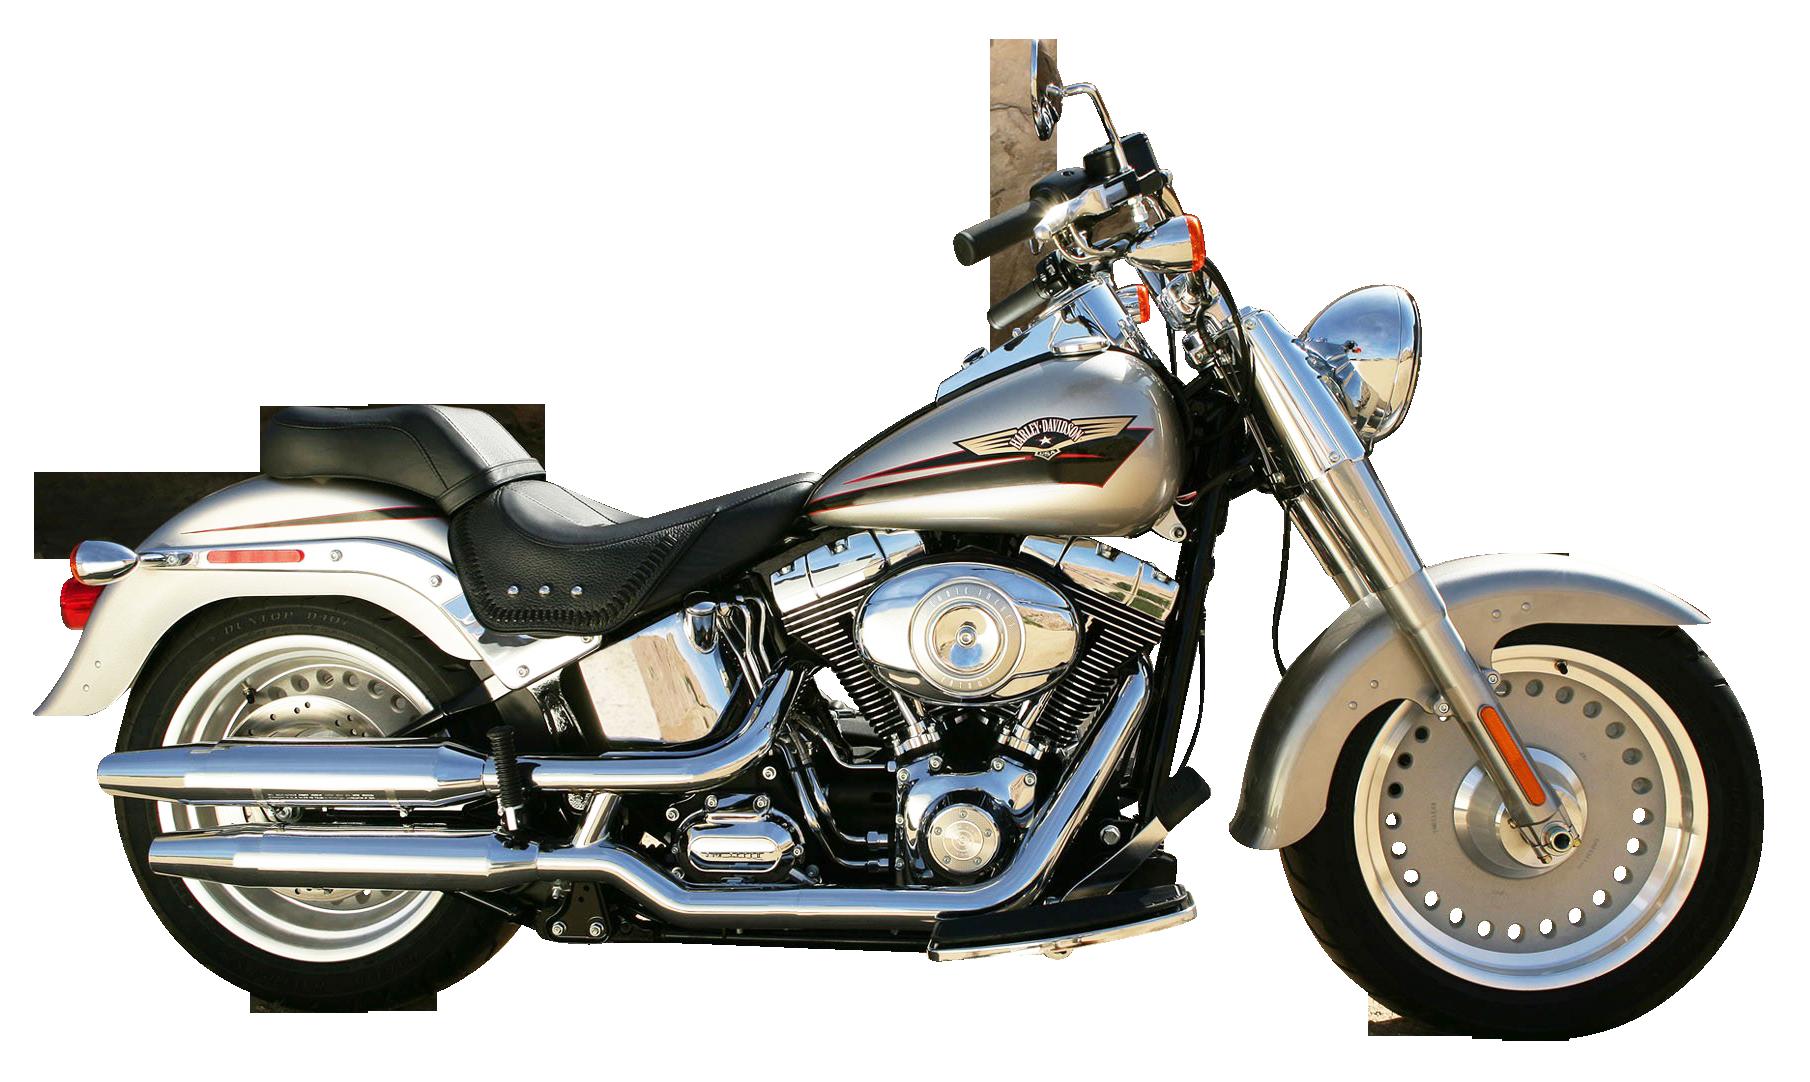 Harley Davidson Silver PNG Image